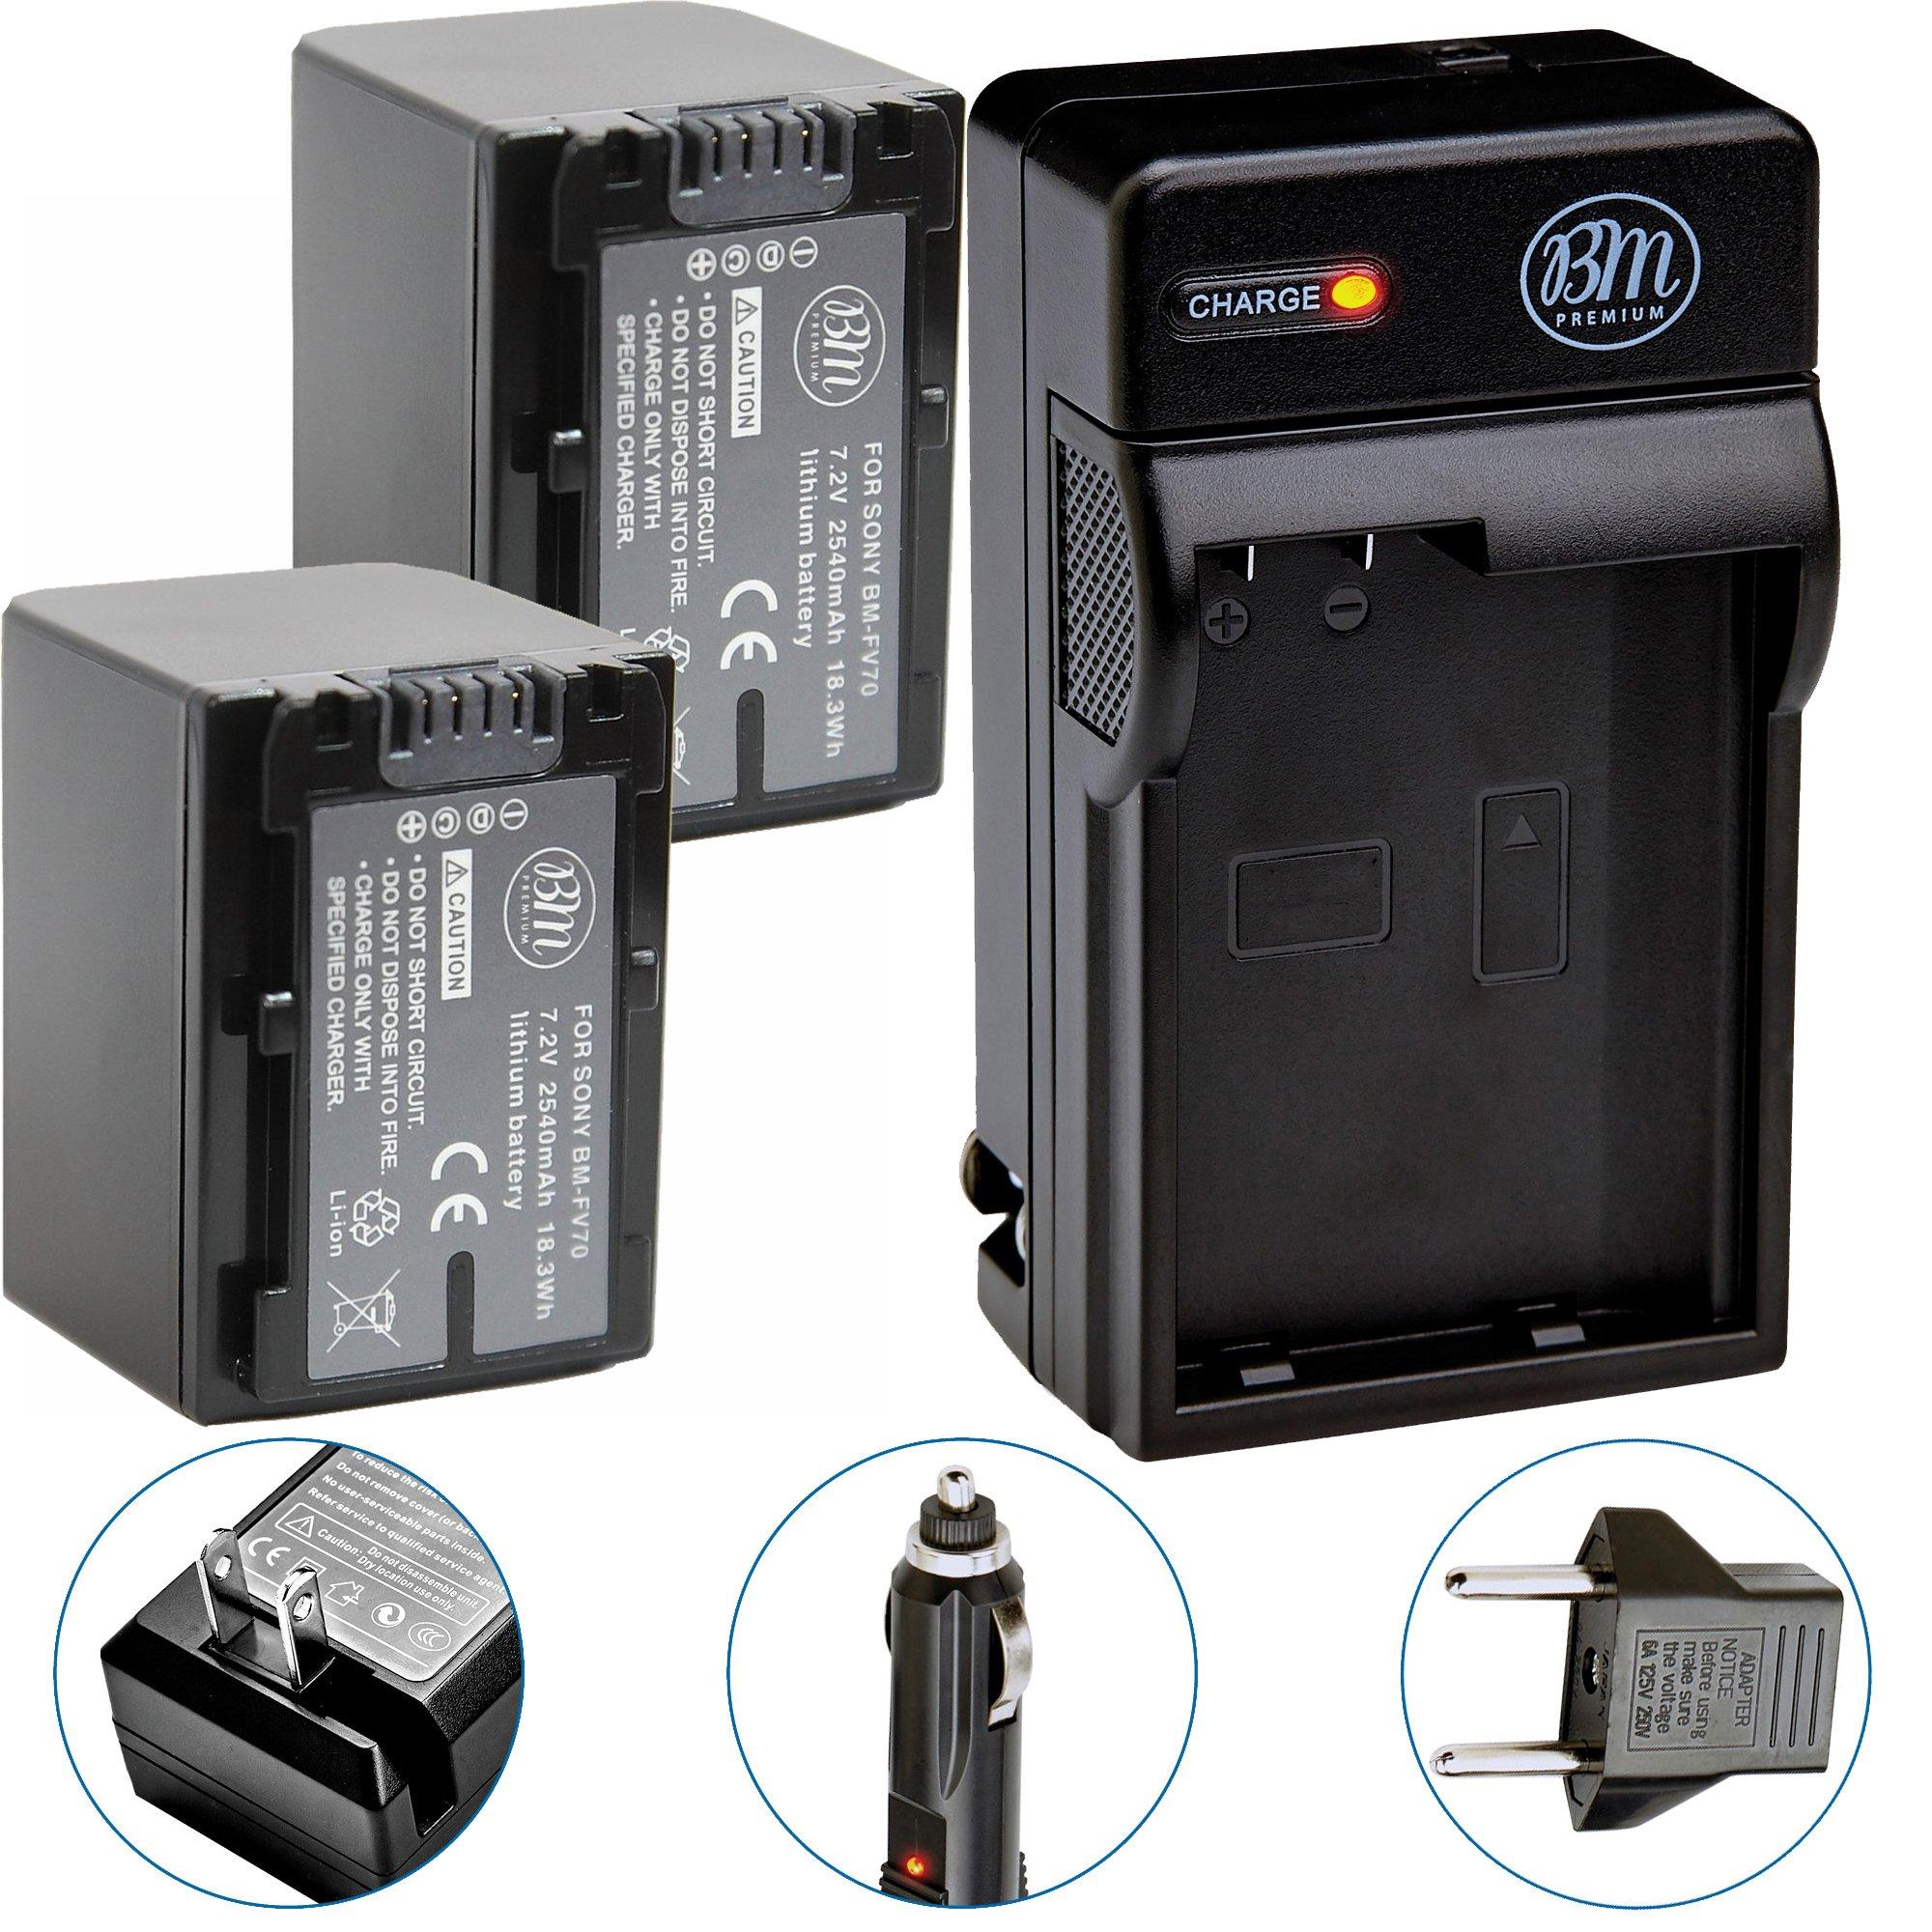 Pack Of 2 NP-FV70 Batteries & Battery Charger Kit for Sony HDR-CX190 HDR-CX200 HDR-CX210 HDR-CX220 HDR-CX230 HDR-CX260V HDR-CX290 HDR-CX380 HDR-CX430V HDR-CX580V HDR-CX760V HDR-PJ230 HDR-PJ380 HDR-PJ430V HDR-PJ580V HDR-PJ650V HDR-PJ710V HDR-PJ760V HDR-PV7